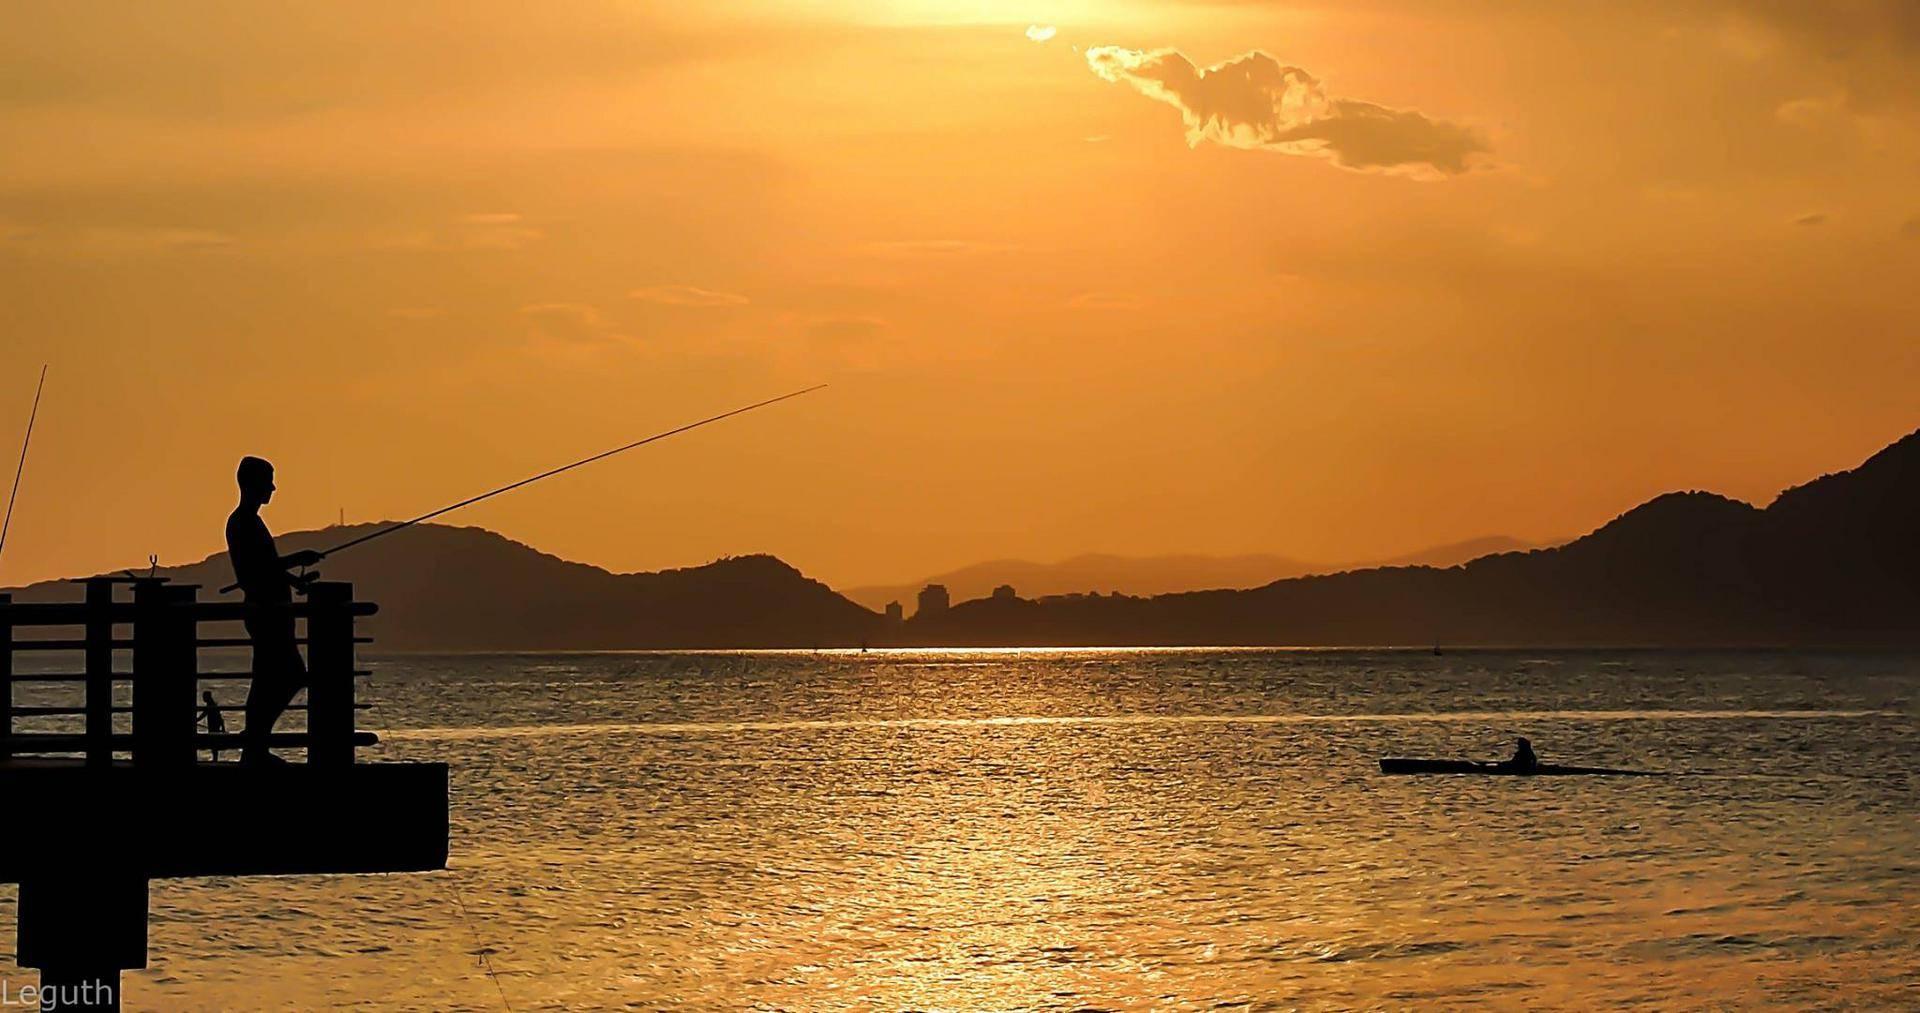 2016-01-31-deck-do-pescador-coisas-de-santos-edson-leguth